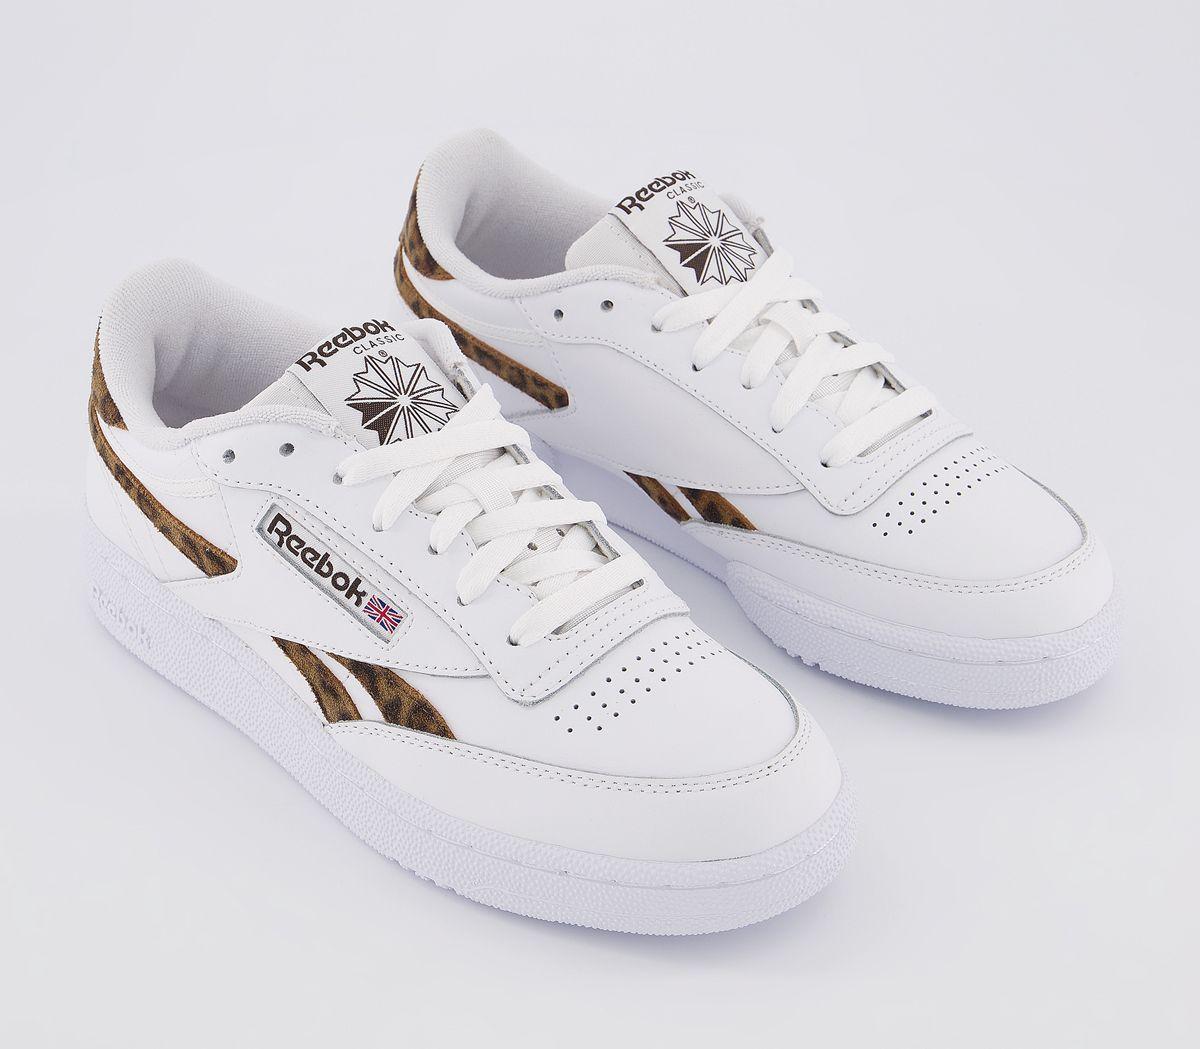 Damen Reebok Rache Plus Sneaker Weiß Natur Leopardenmuster